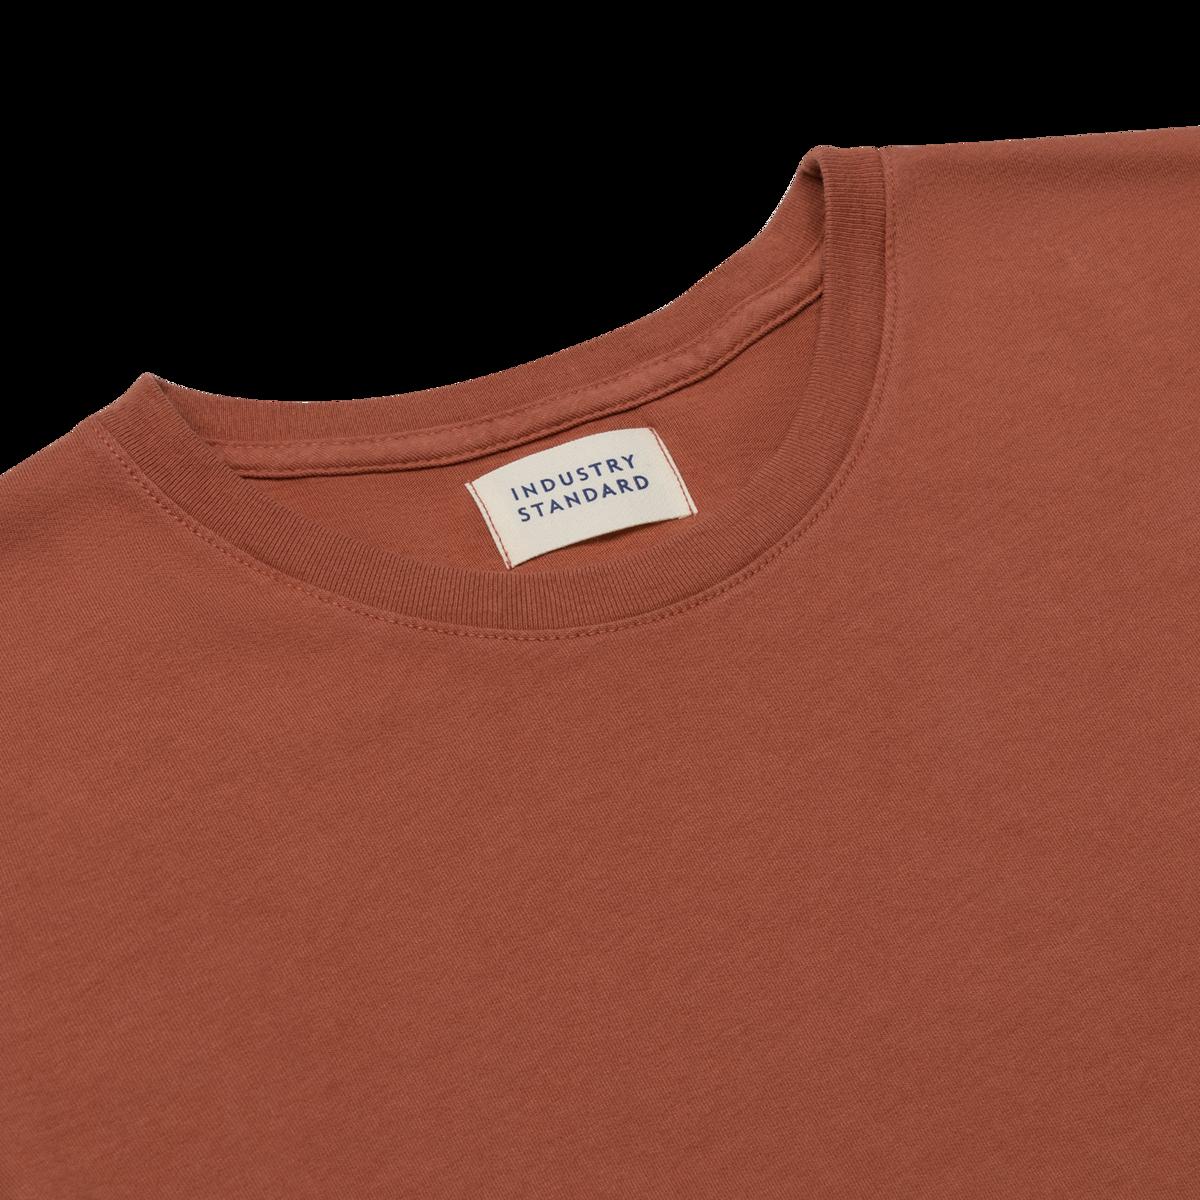 T-shirt close up product image